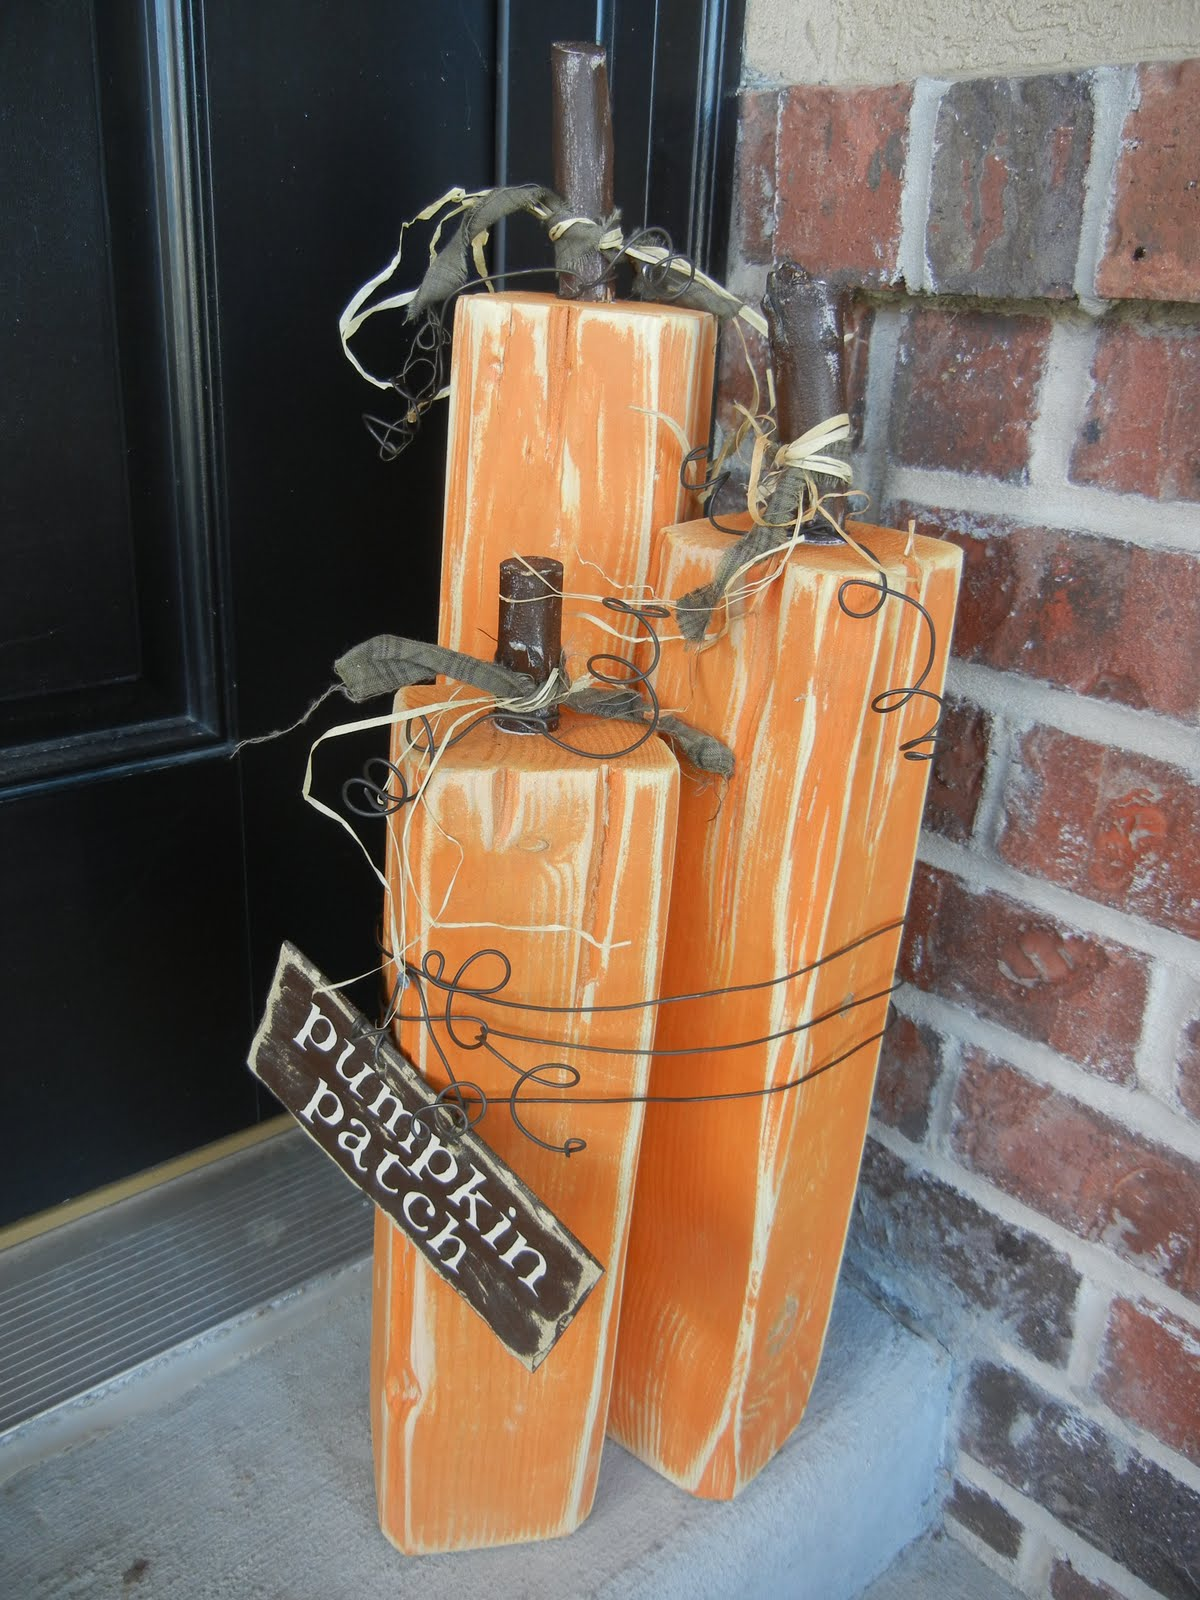 Pumpkin stems for crafts - Pumpkin Stems For Crafts Pumpkin Stems For Crafts Fall Craft Night